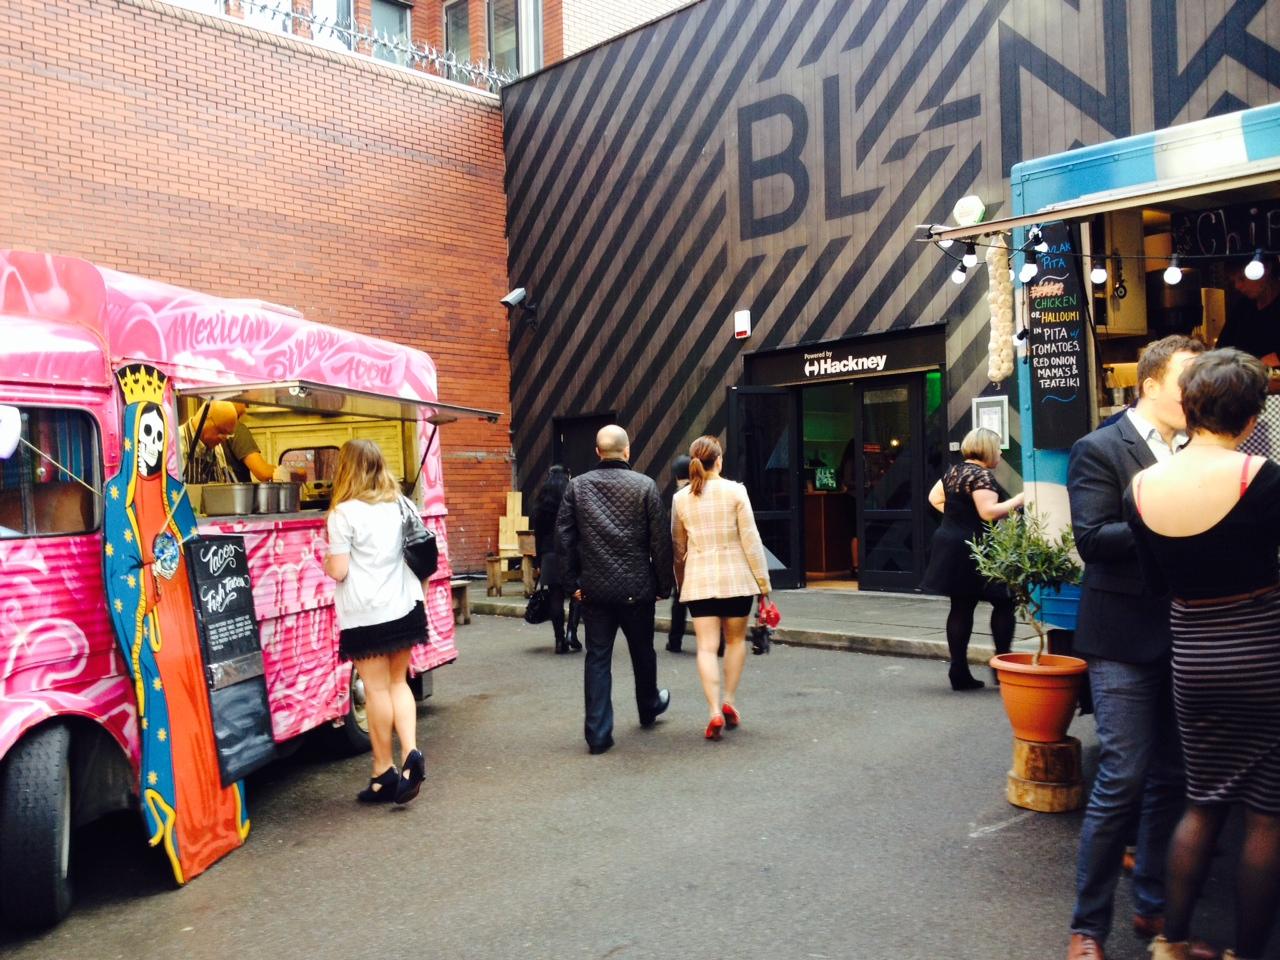 BL-NK Street food.JPG